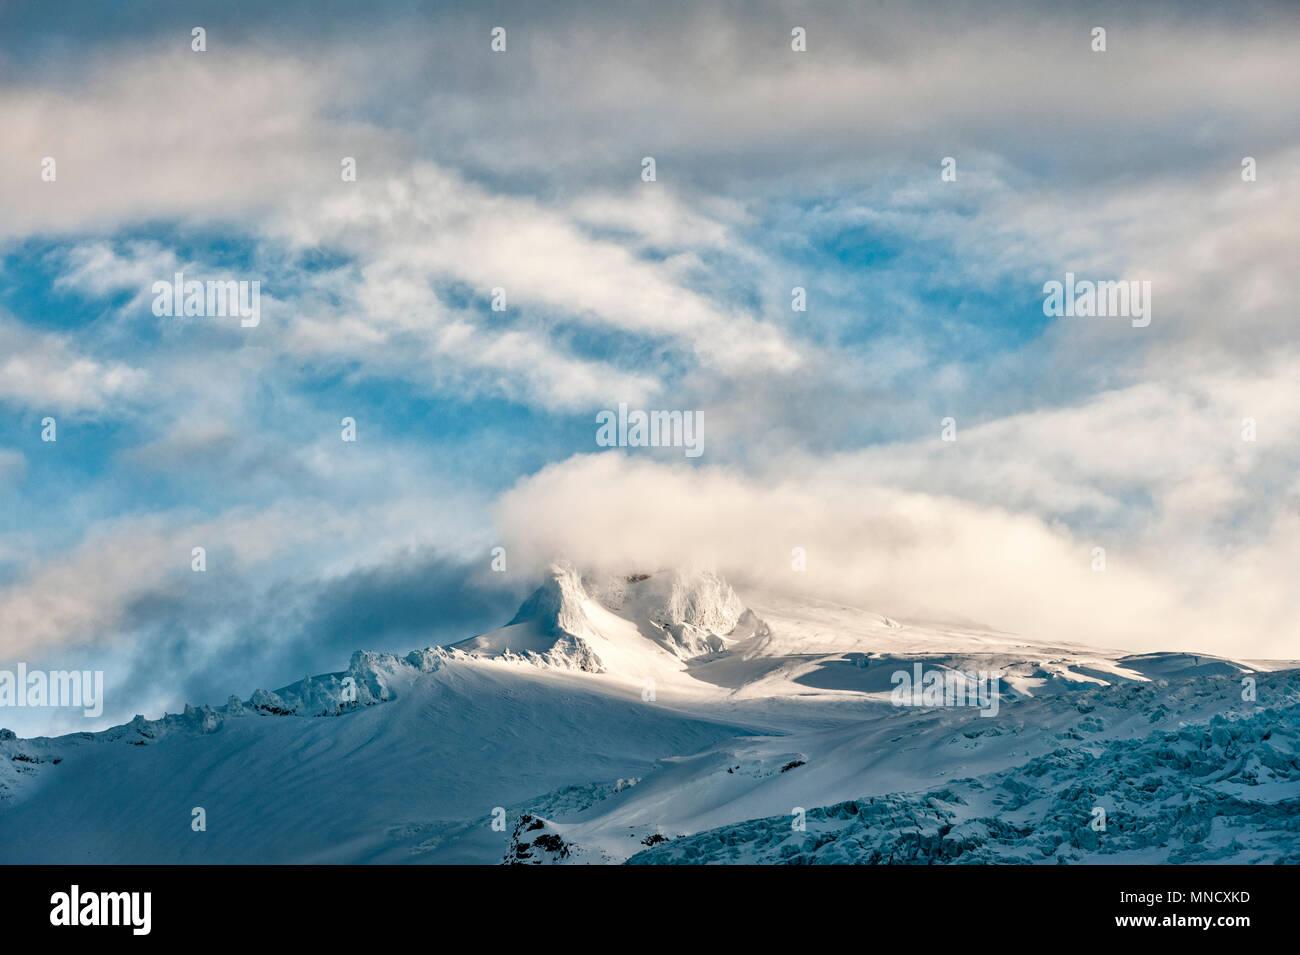 South Iceland. Hvannadalshnúkur, at 2110m the highest peak in Iceland. It is part of the Öræfajökull volcano in the Vatnajökull National Park - Stock Image